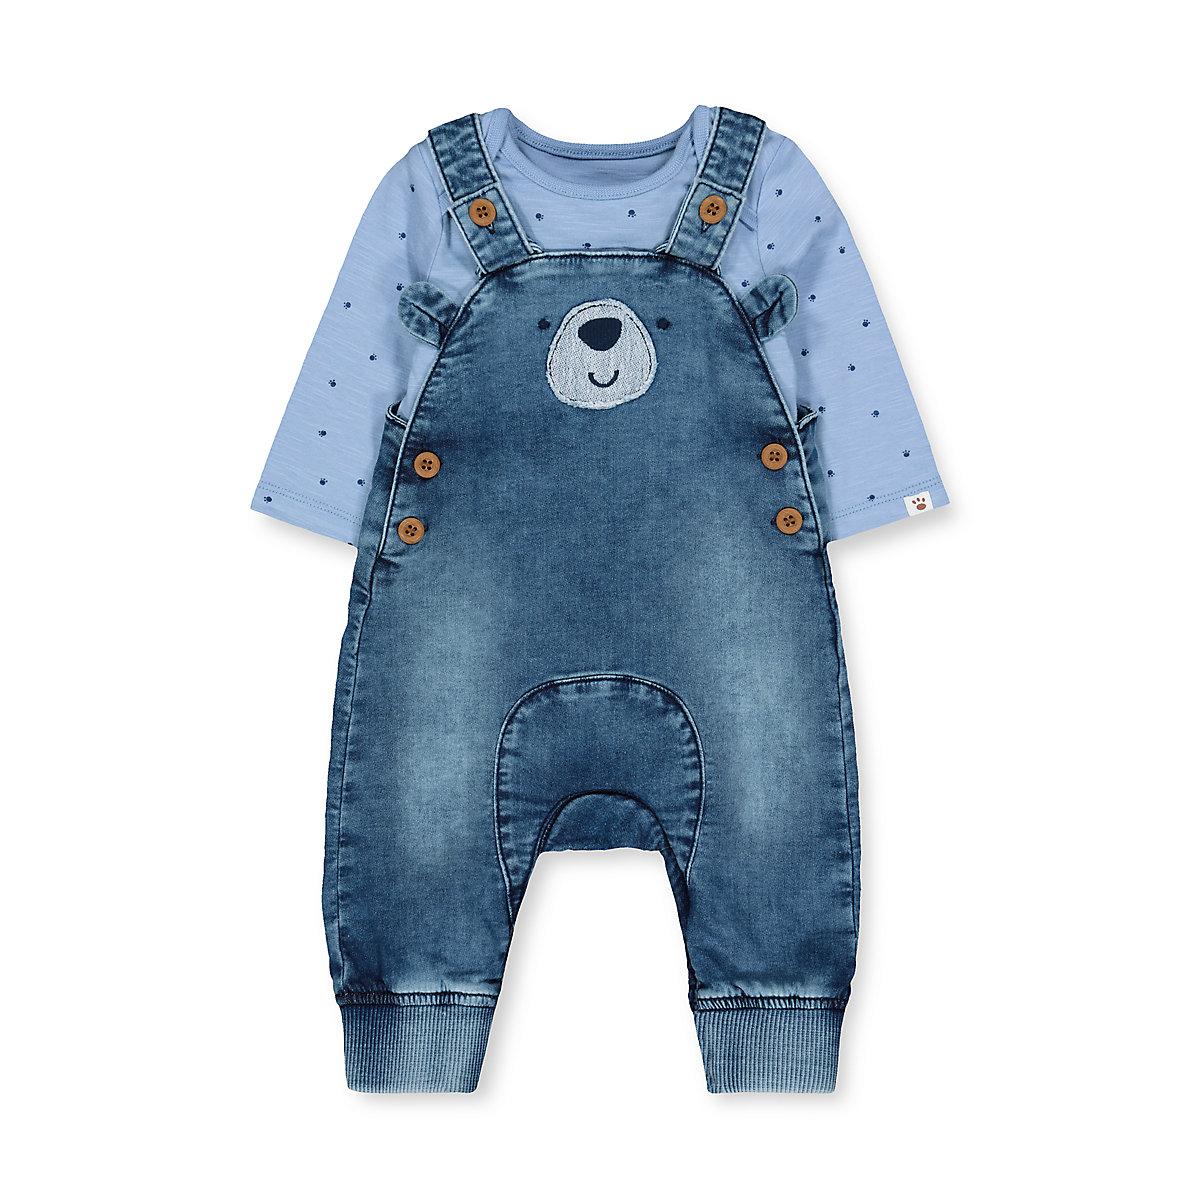 denim bear dungarees and blue paw bodysuit set